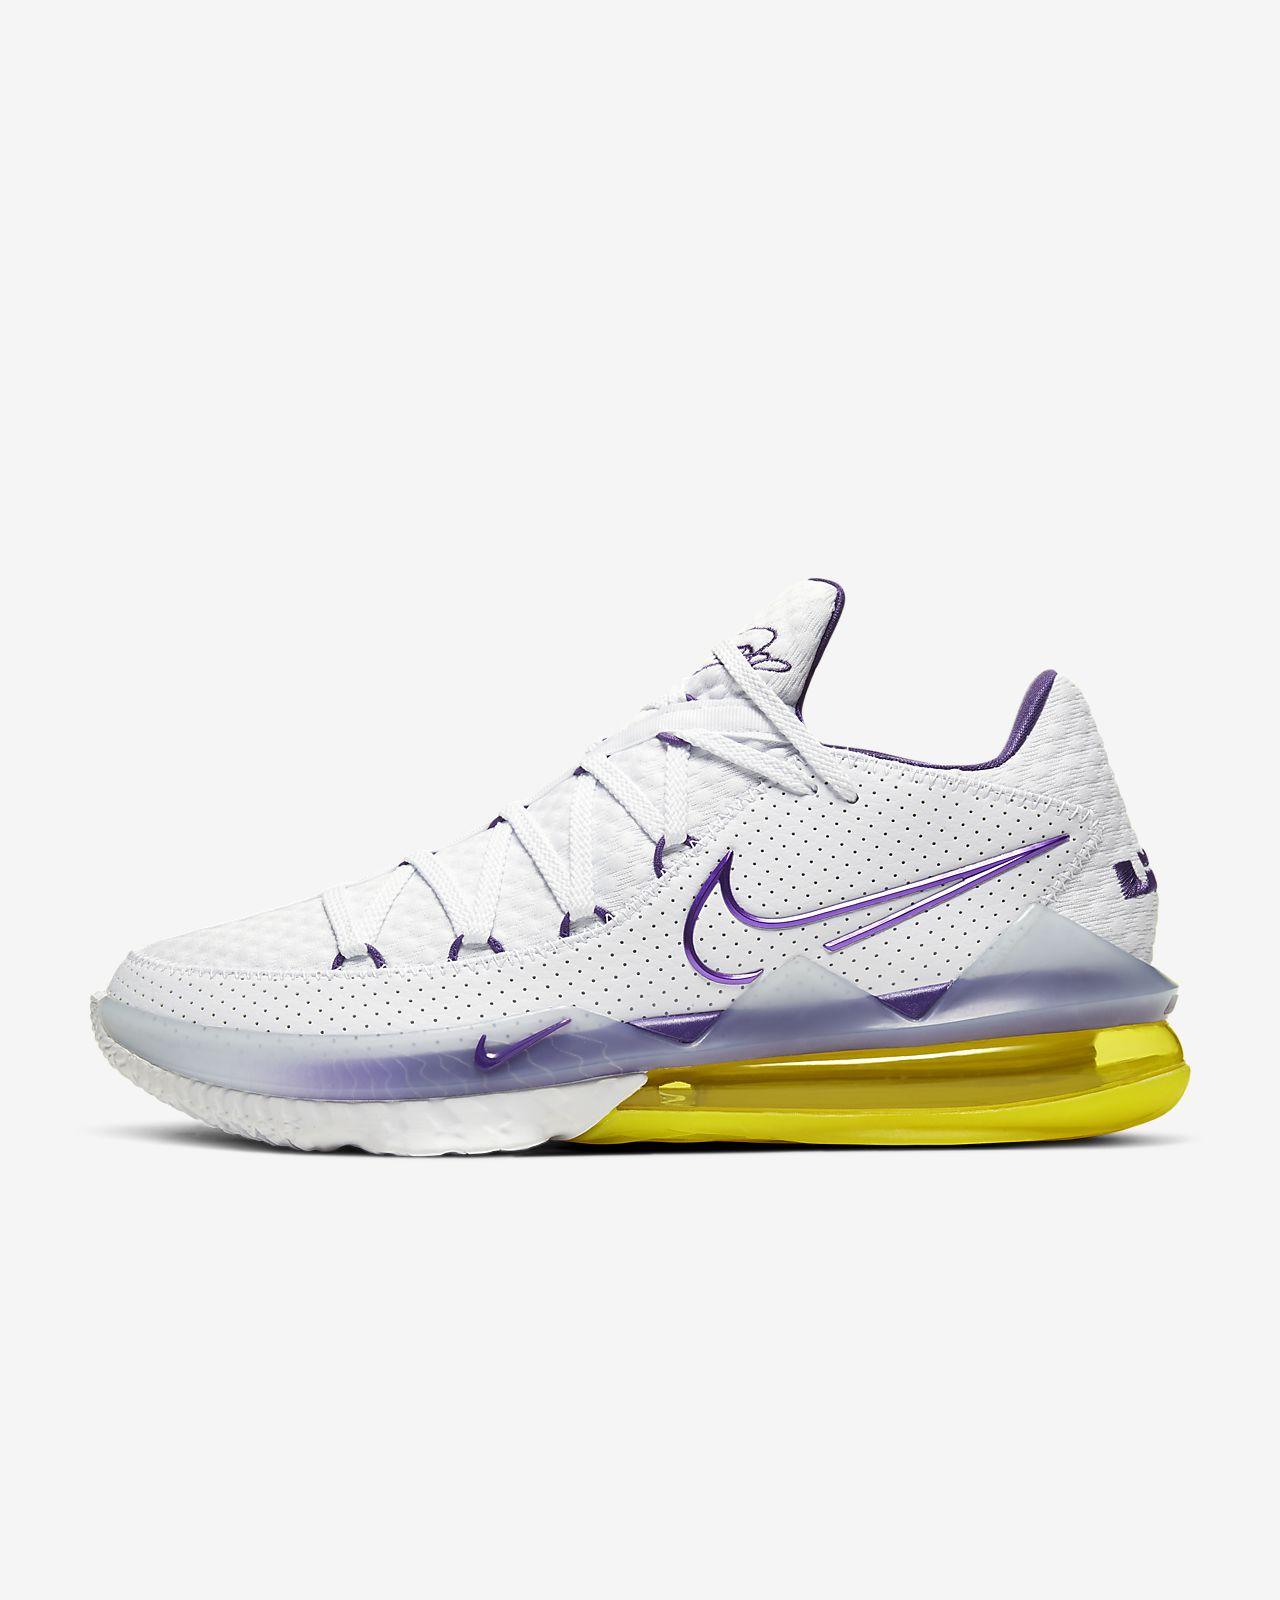 Chaussure de basketball LeBron 17 Low